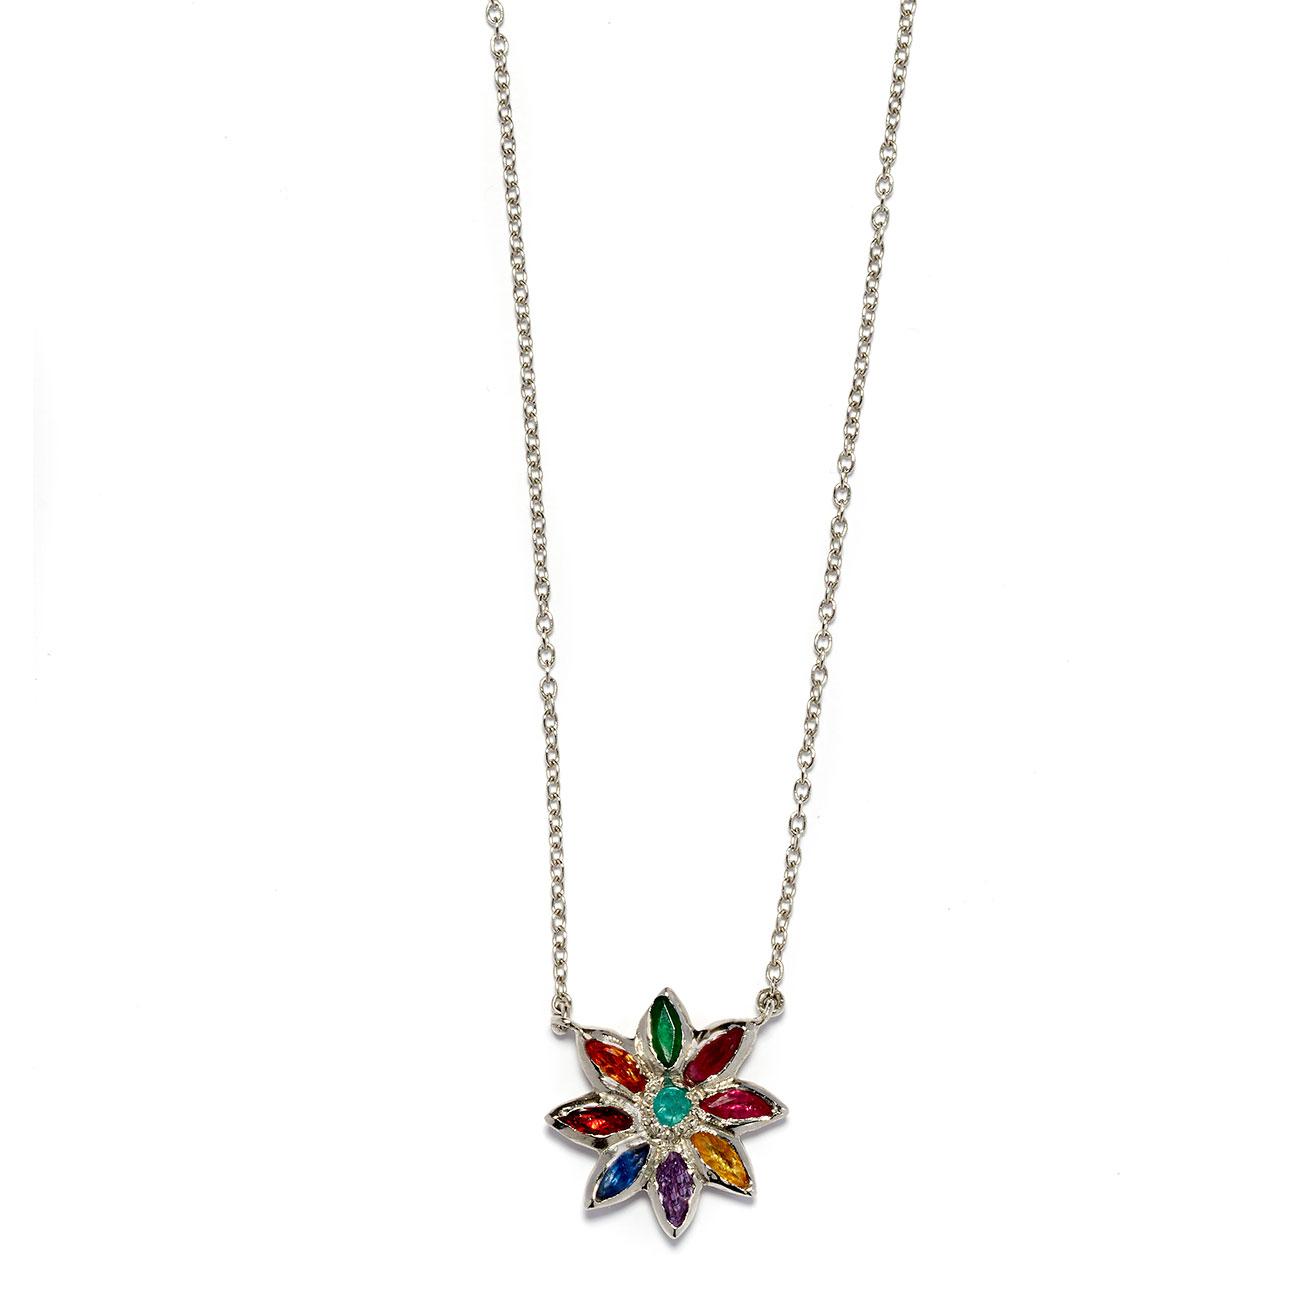 Platinum Flower Power Necklace - Elisa Solomon